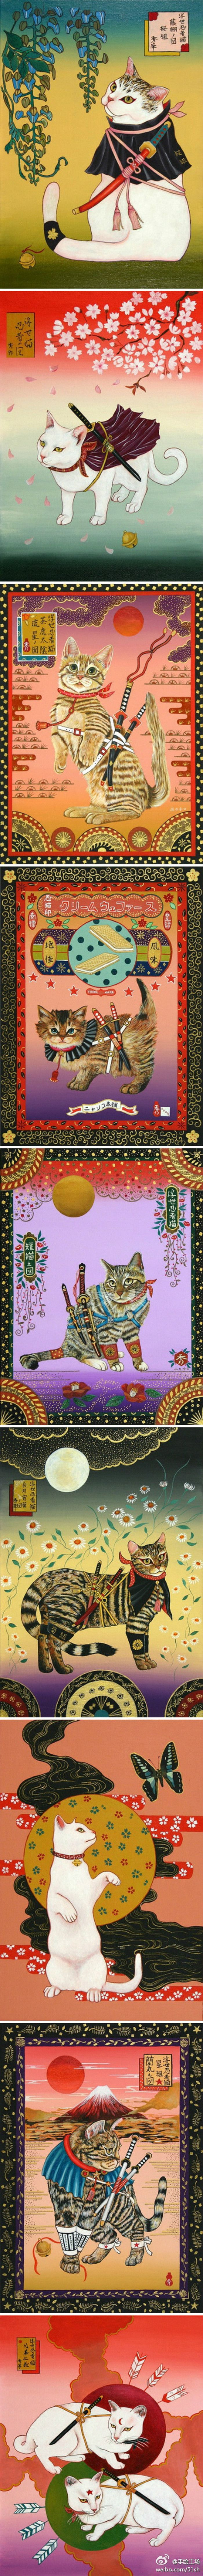 "Ukiyo-e Ninja Cat illustrations -- 田中秀治~浮世忍者猫~ (""Tanaka Shuji"" may be the painter?)  There are more (and single frames) pinned at  https://www.pinterest.com/yrauntruth/felinity-arty-cats/"